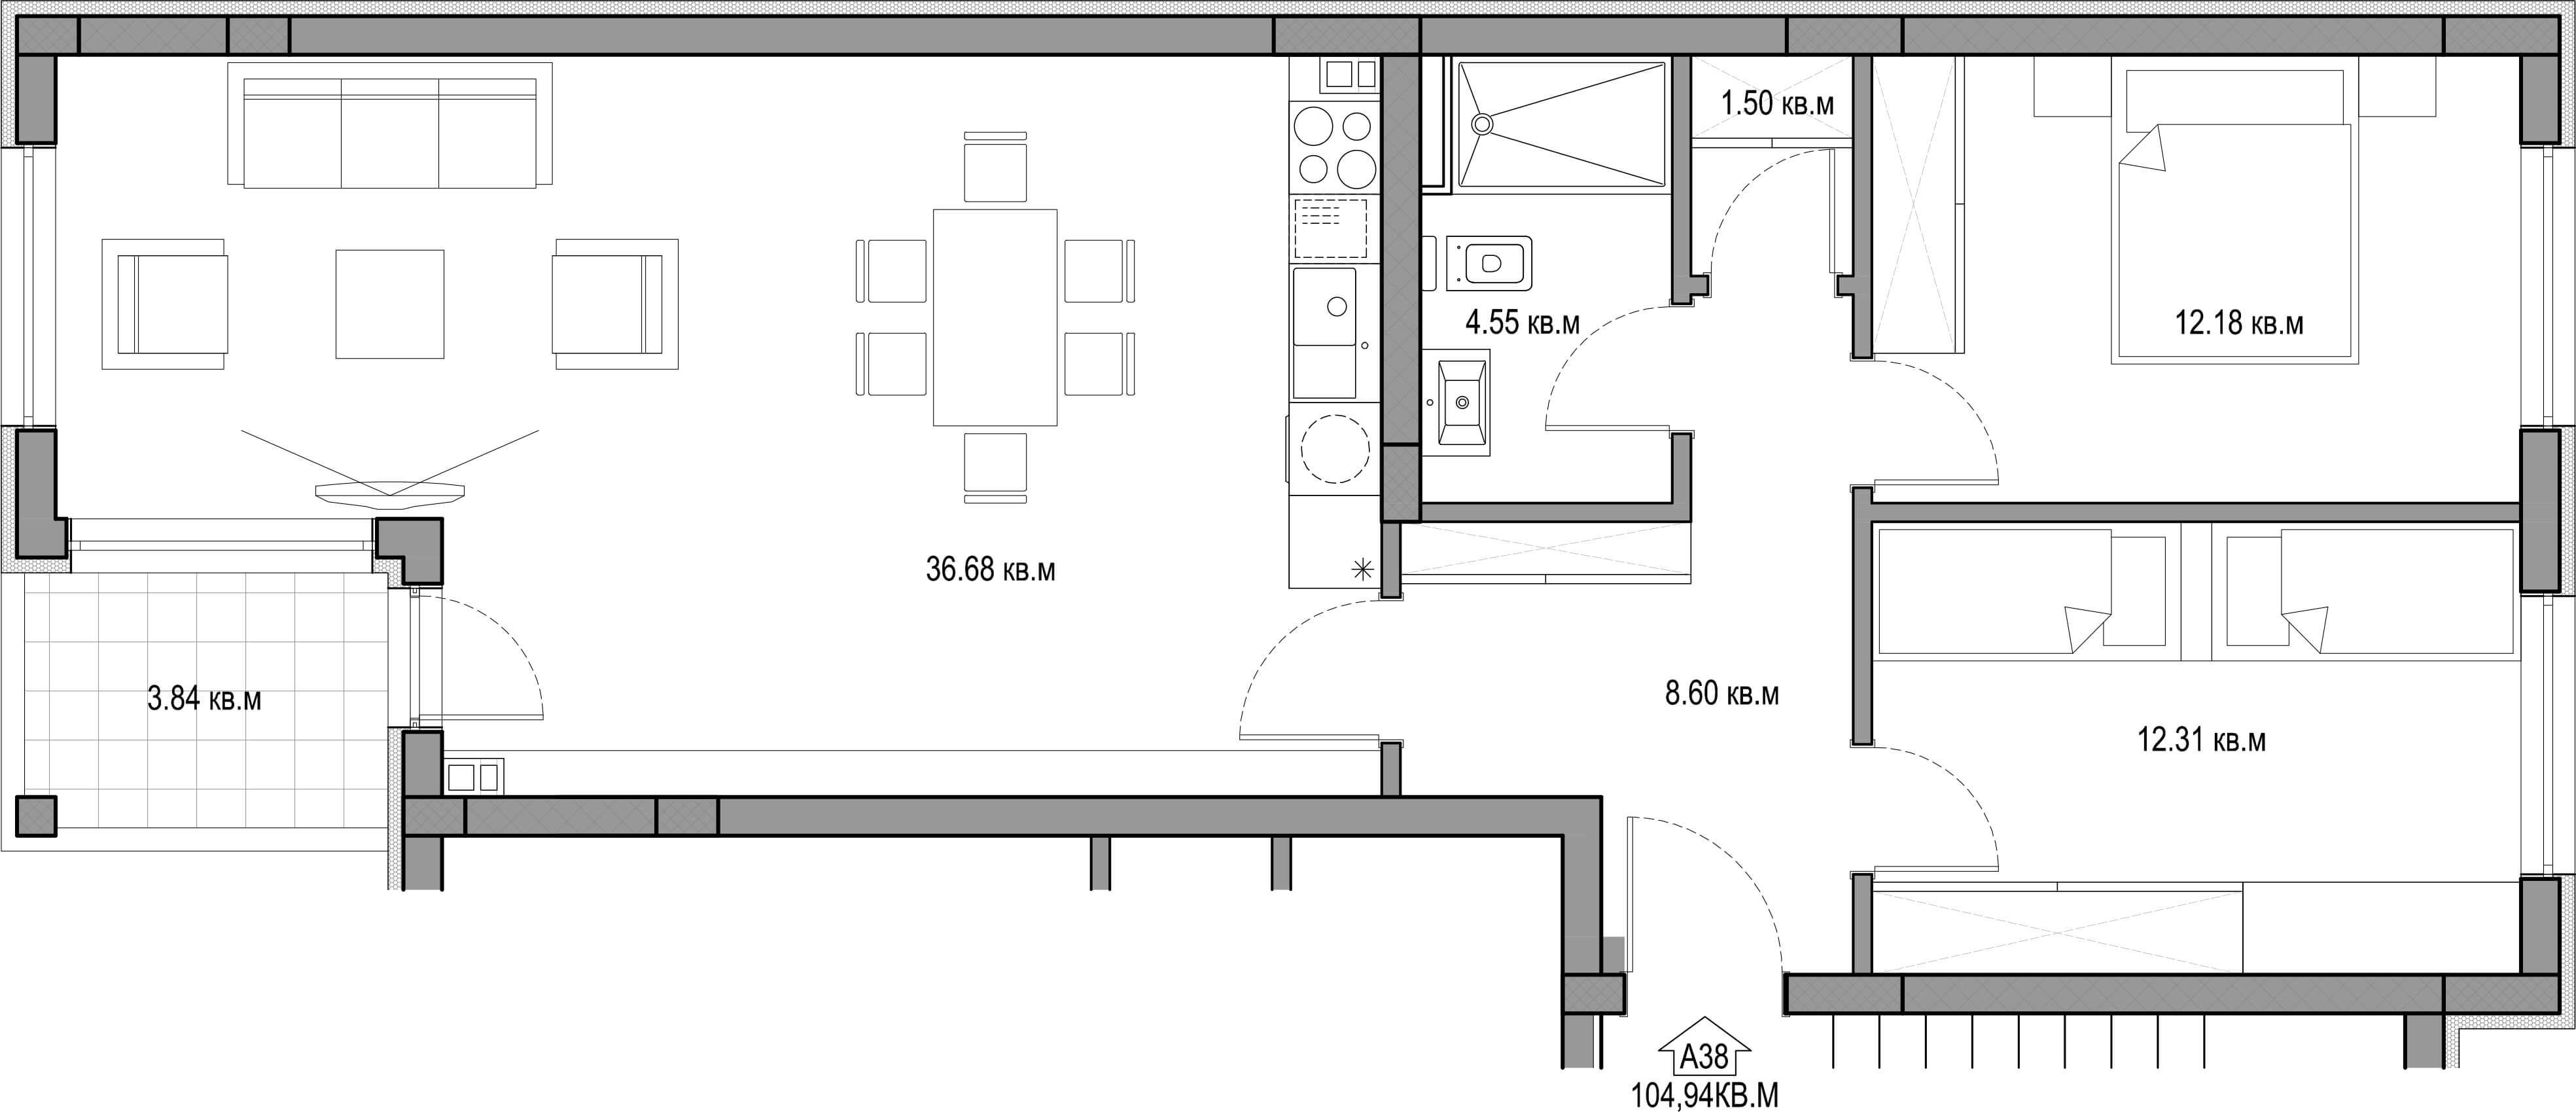 Vinitsa_Apartment_2_38